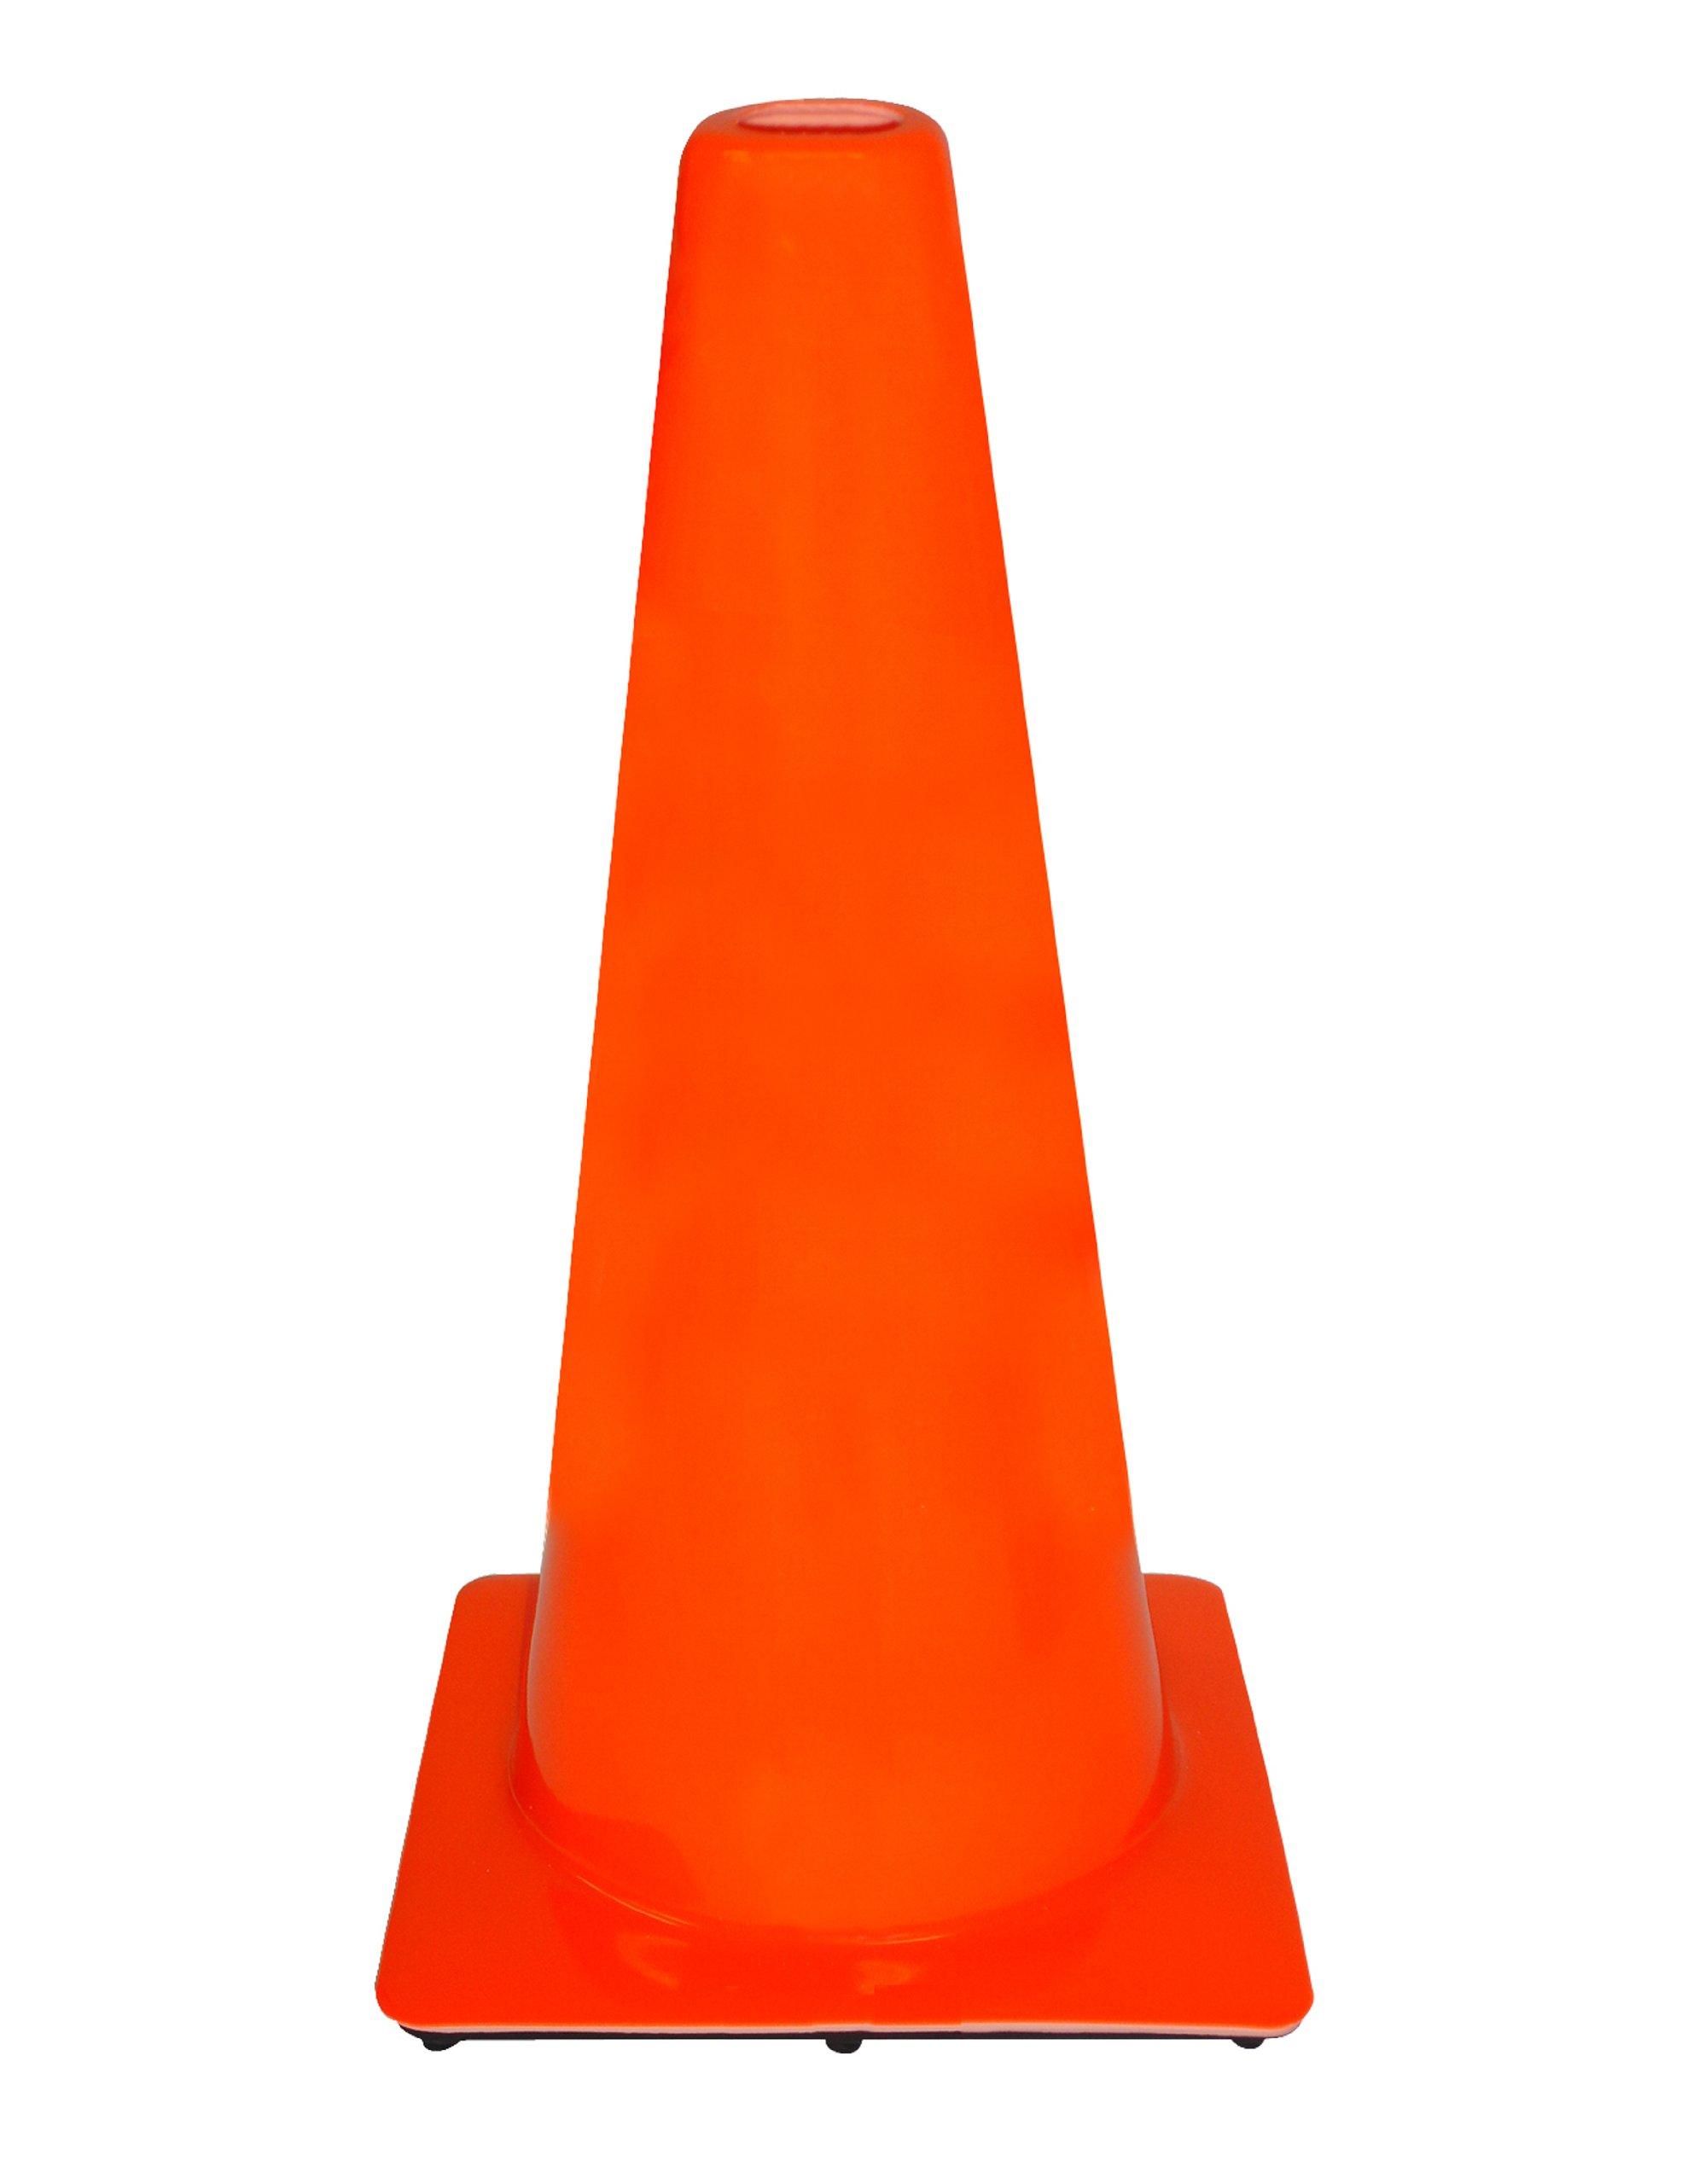 3M 90129-00002 PVC Traffic Safety Cone, 28-Inch